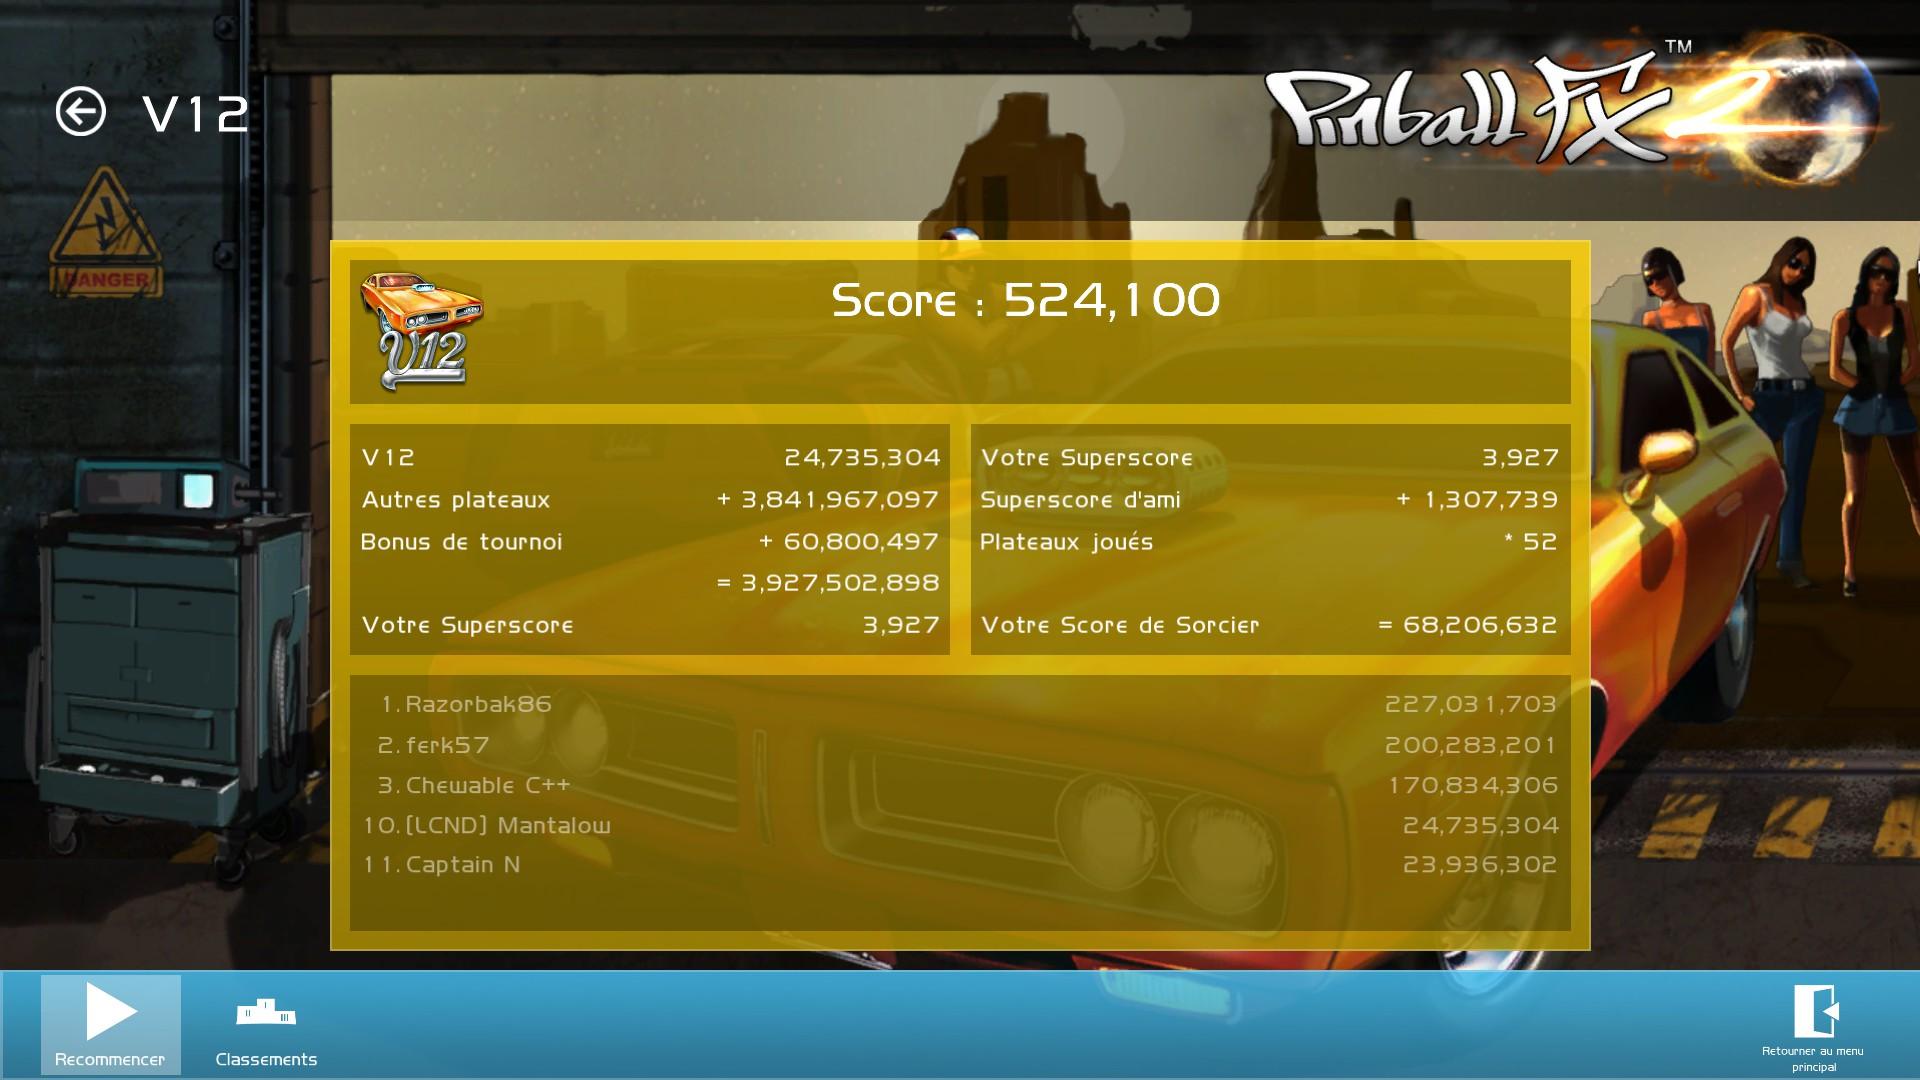 Mantalow: Zen Pinball 2: V12 (PC) 24,735,304 points on 2015-06-27 07:35:26